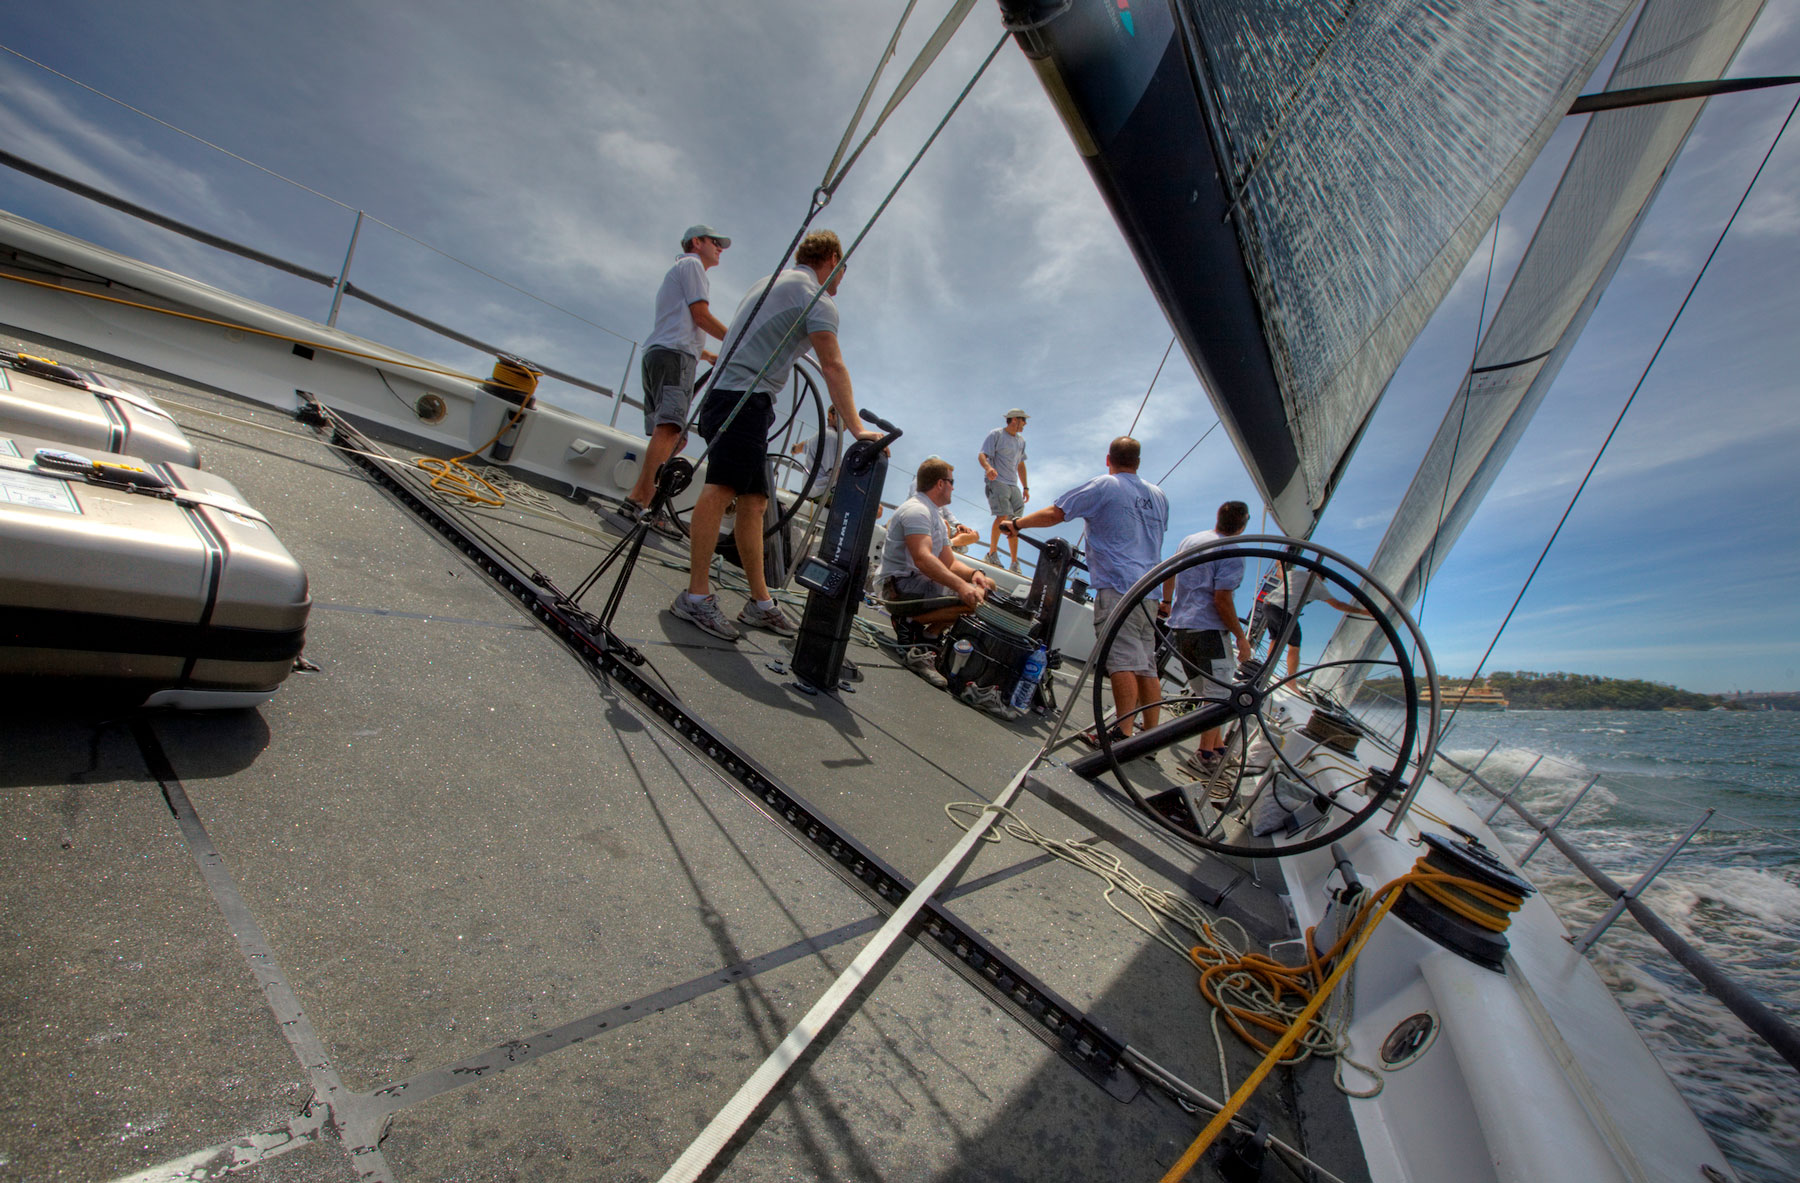 oceanyacht-safety-slider-2